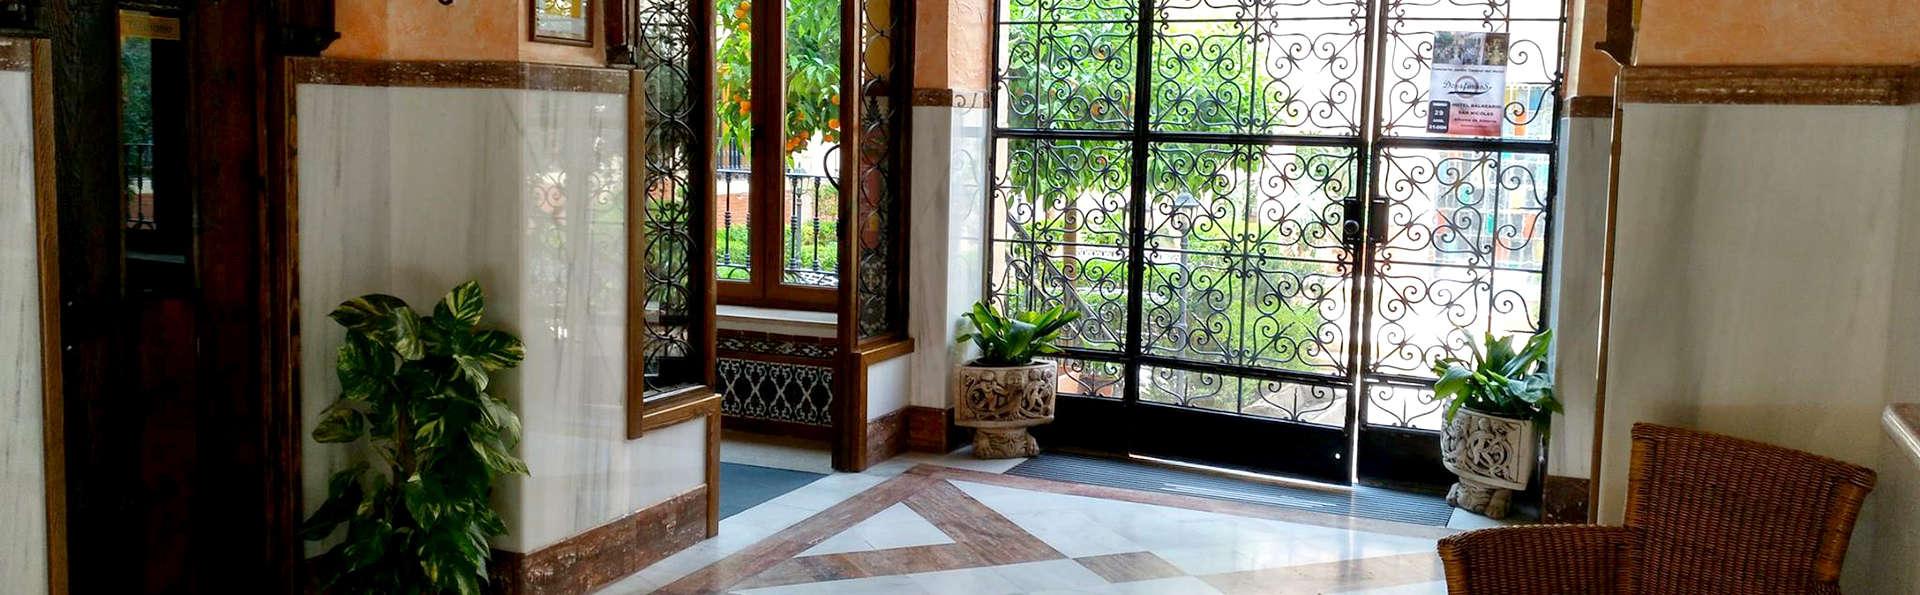 Hotel Balneario San Nicolás - Edit_Lobby.jpg